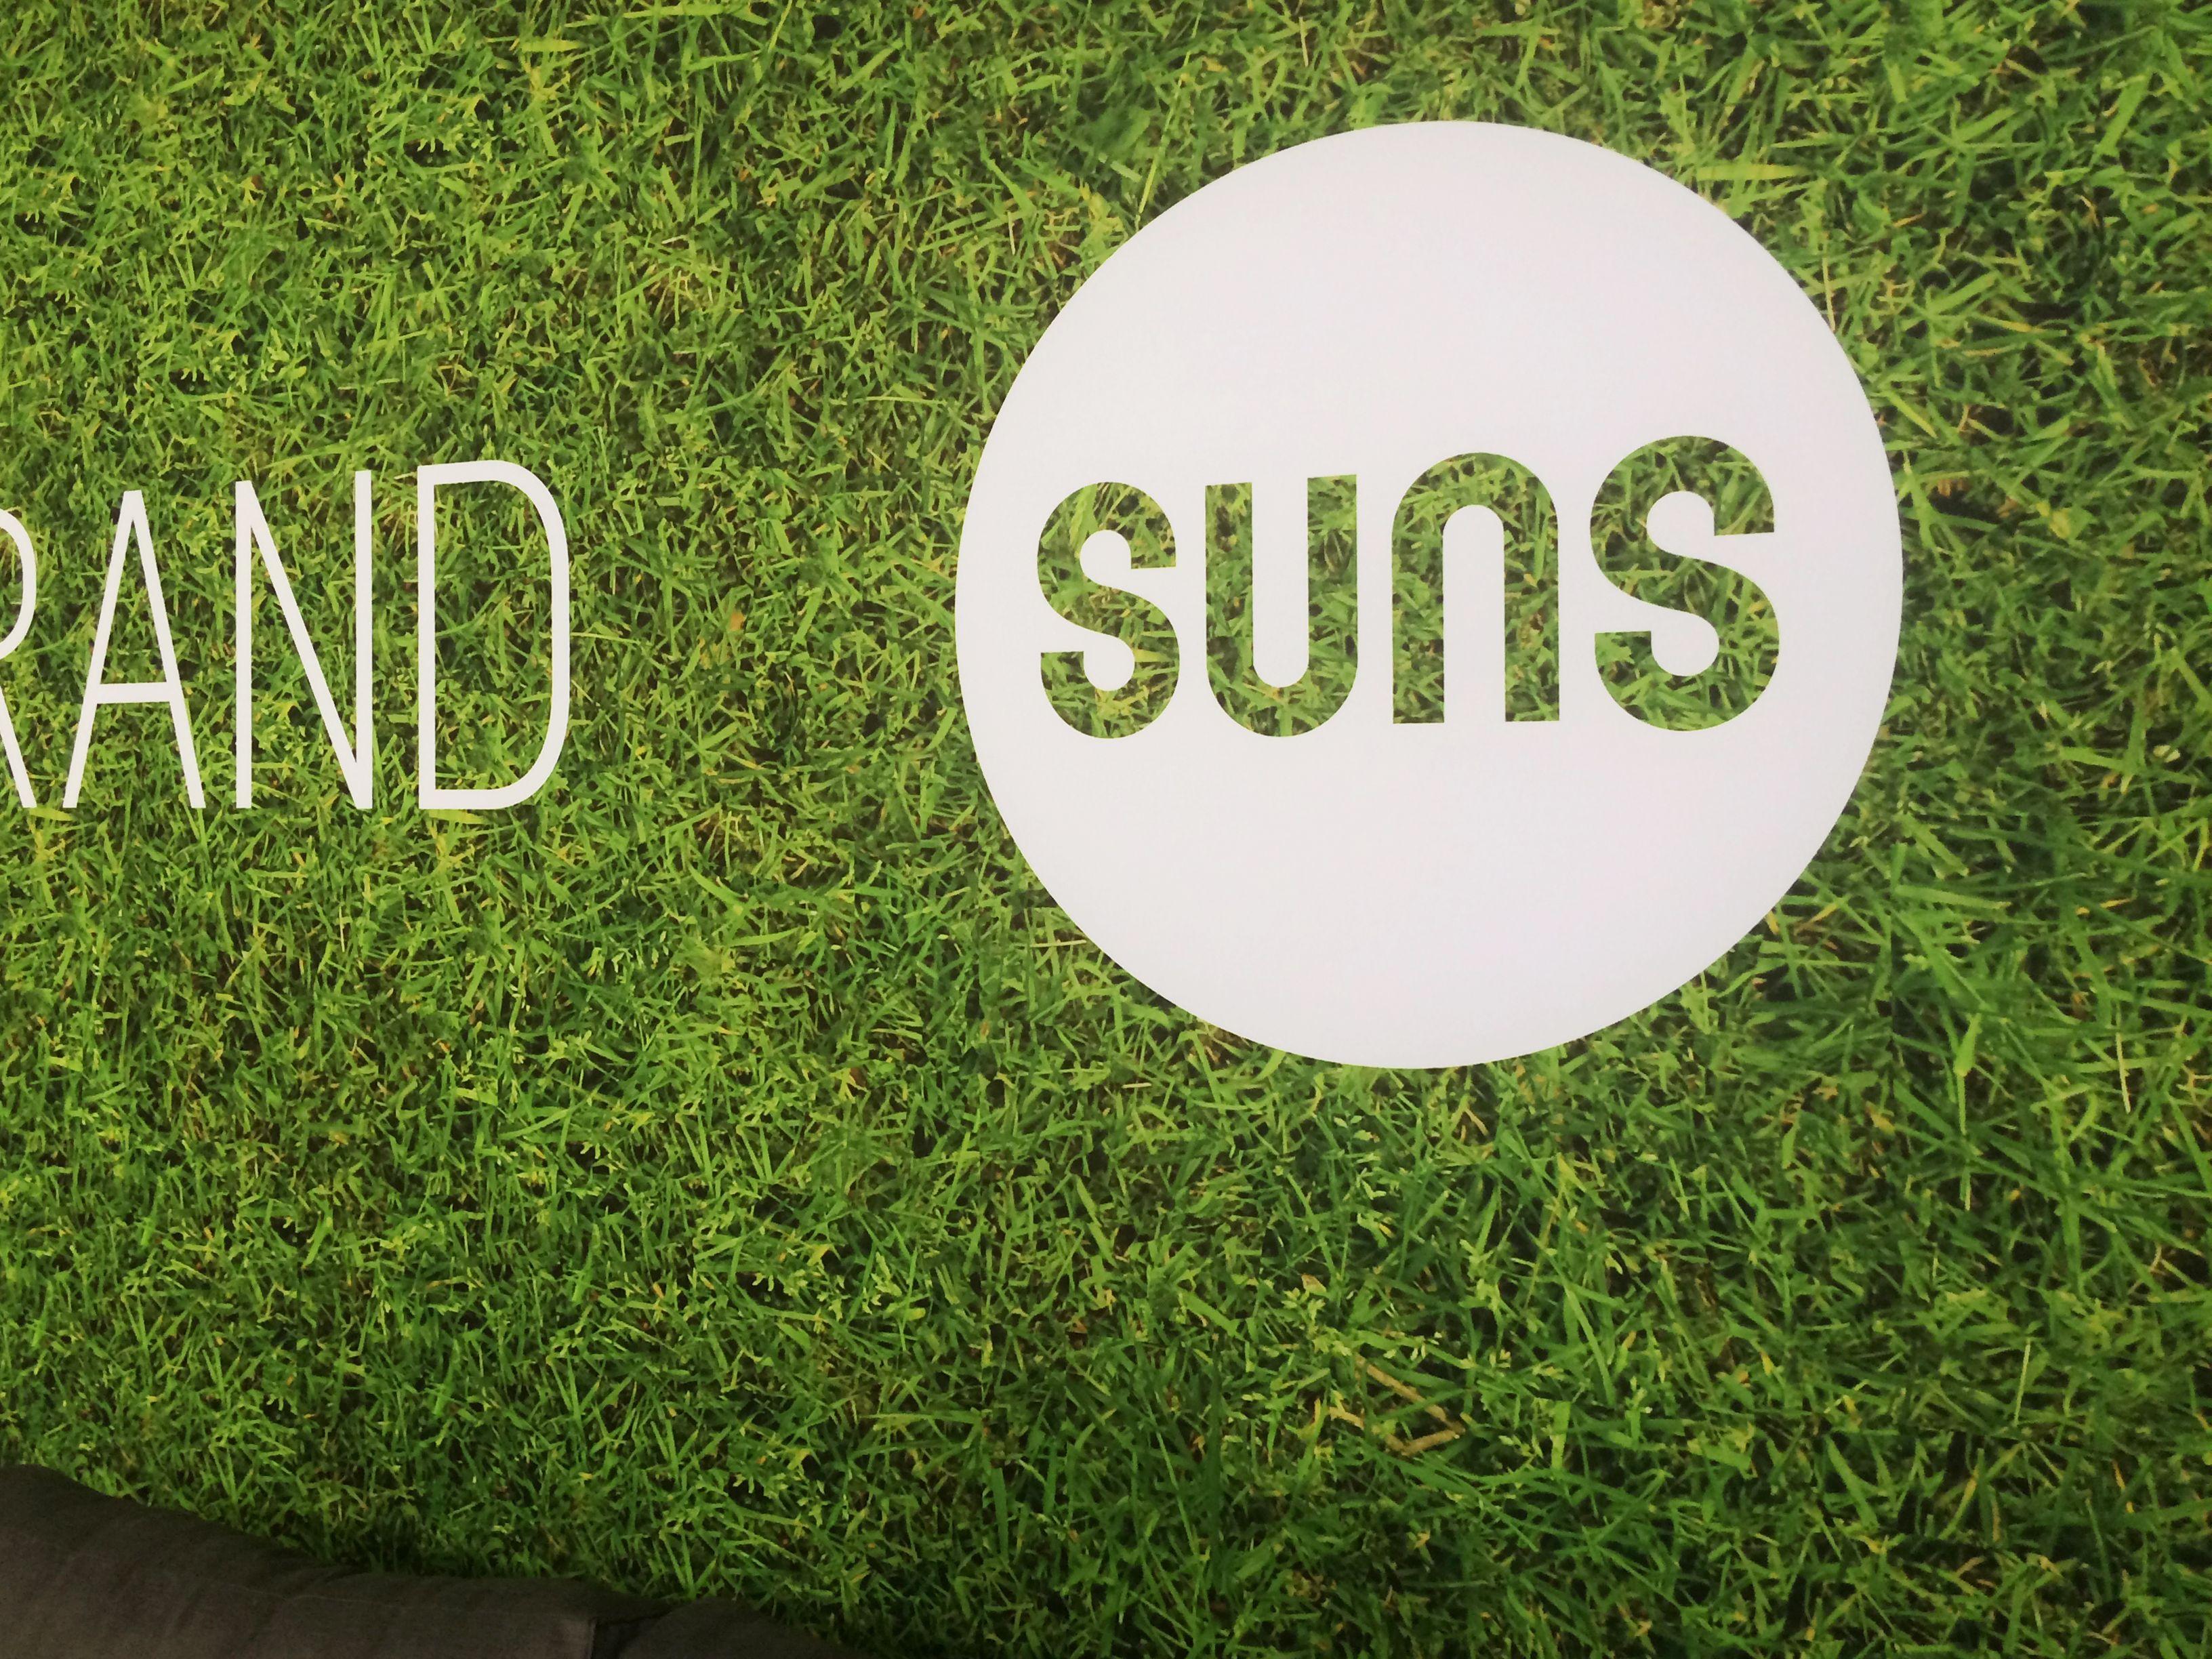 SUNS Presents: Collection 2015   B3 Tuinmeubelenbeurs   Garden Trade Fair  In Houten 16 17 June 2014   SUNS   GARDEN TRADE FAIR   Pinterest    Presents, Sun ...